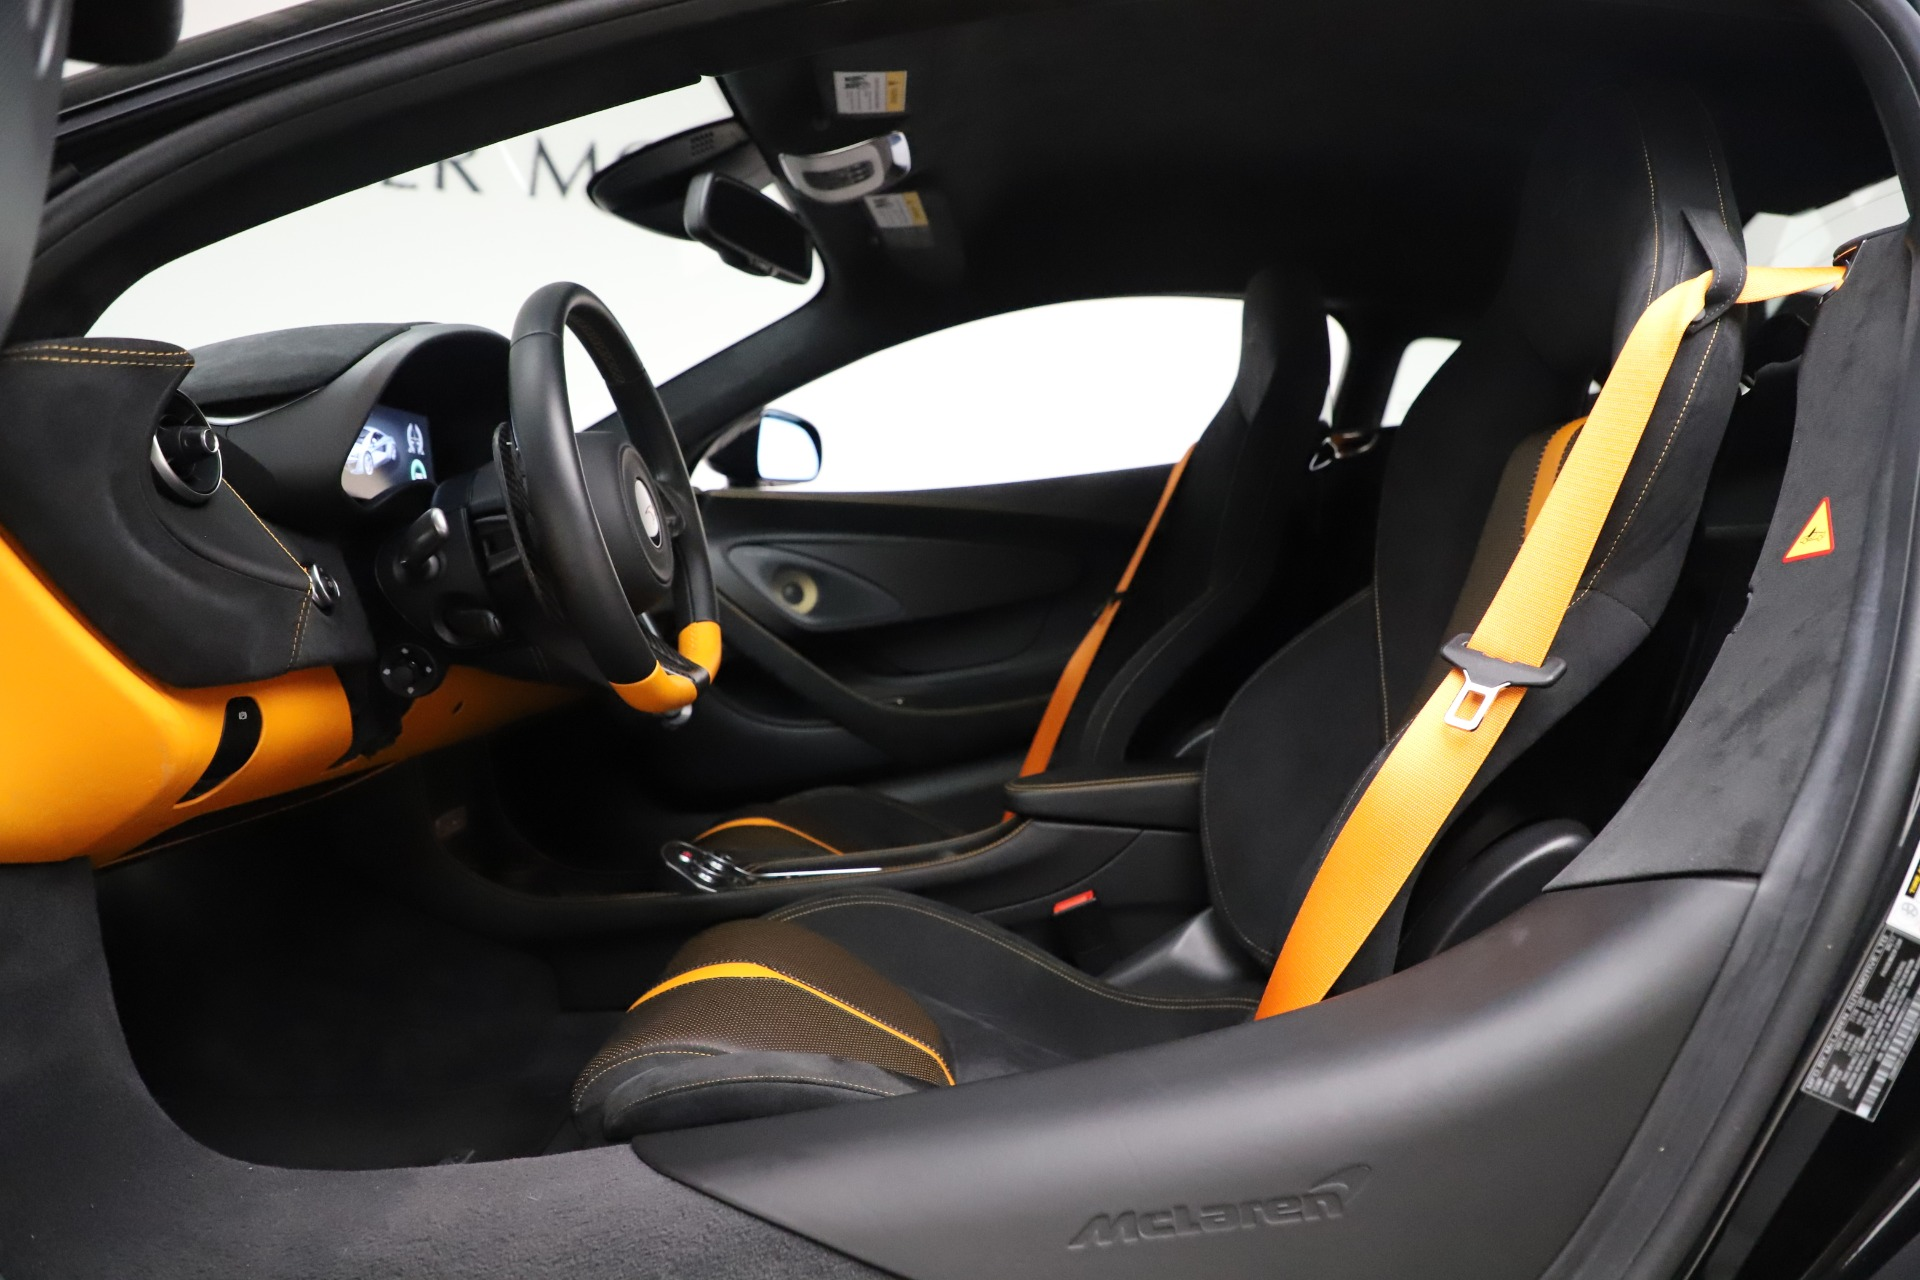 Used 2017 McLaren 570S Coupe For Sale In Westport, CT 3503_p17